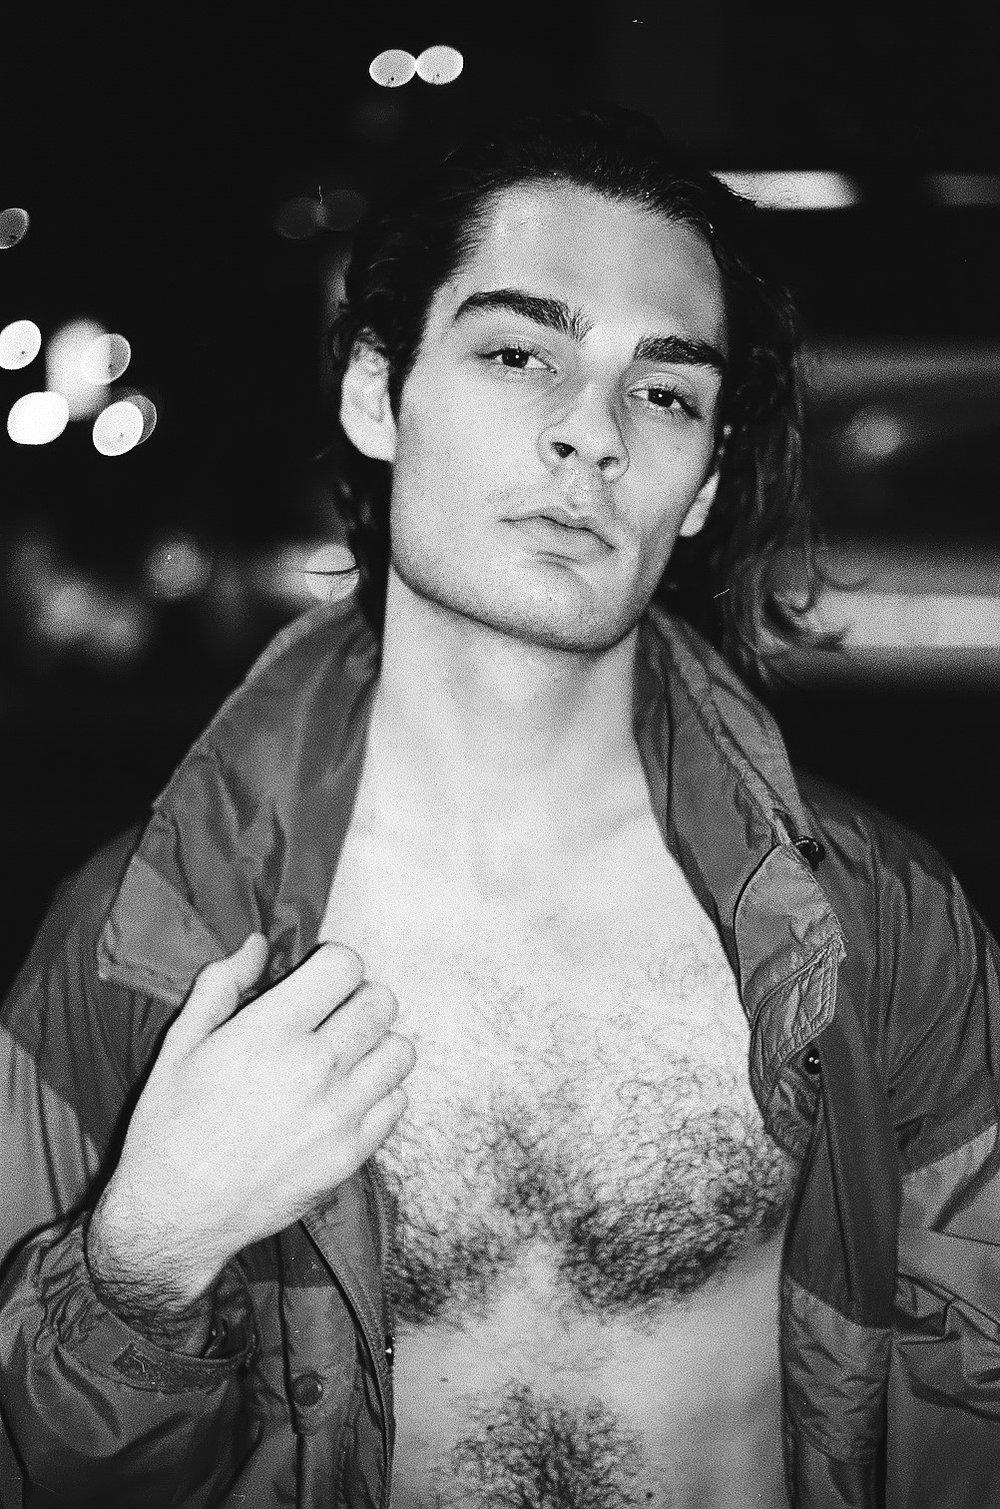 Model - Kyle Neill